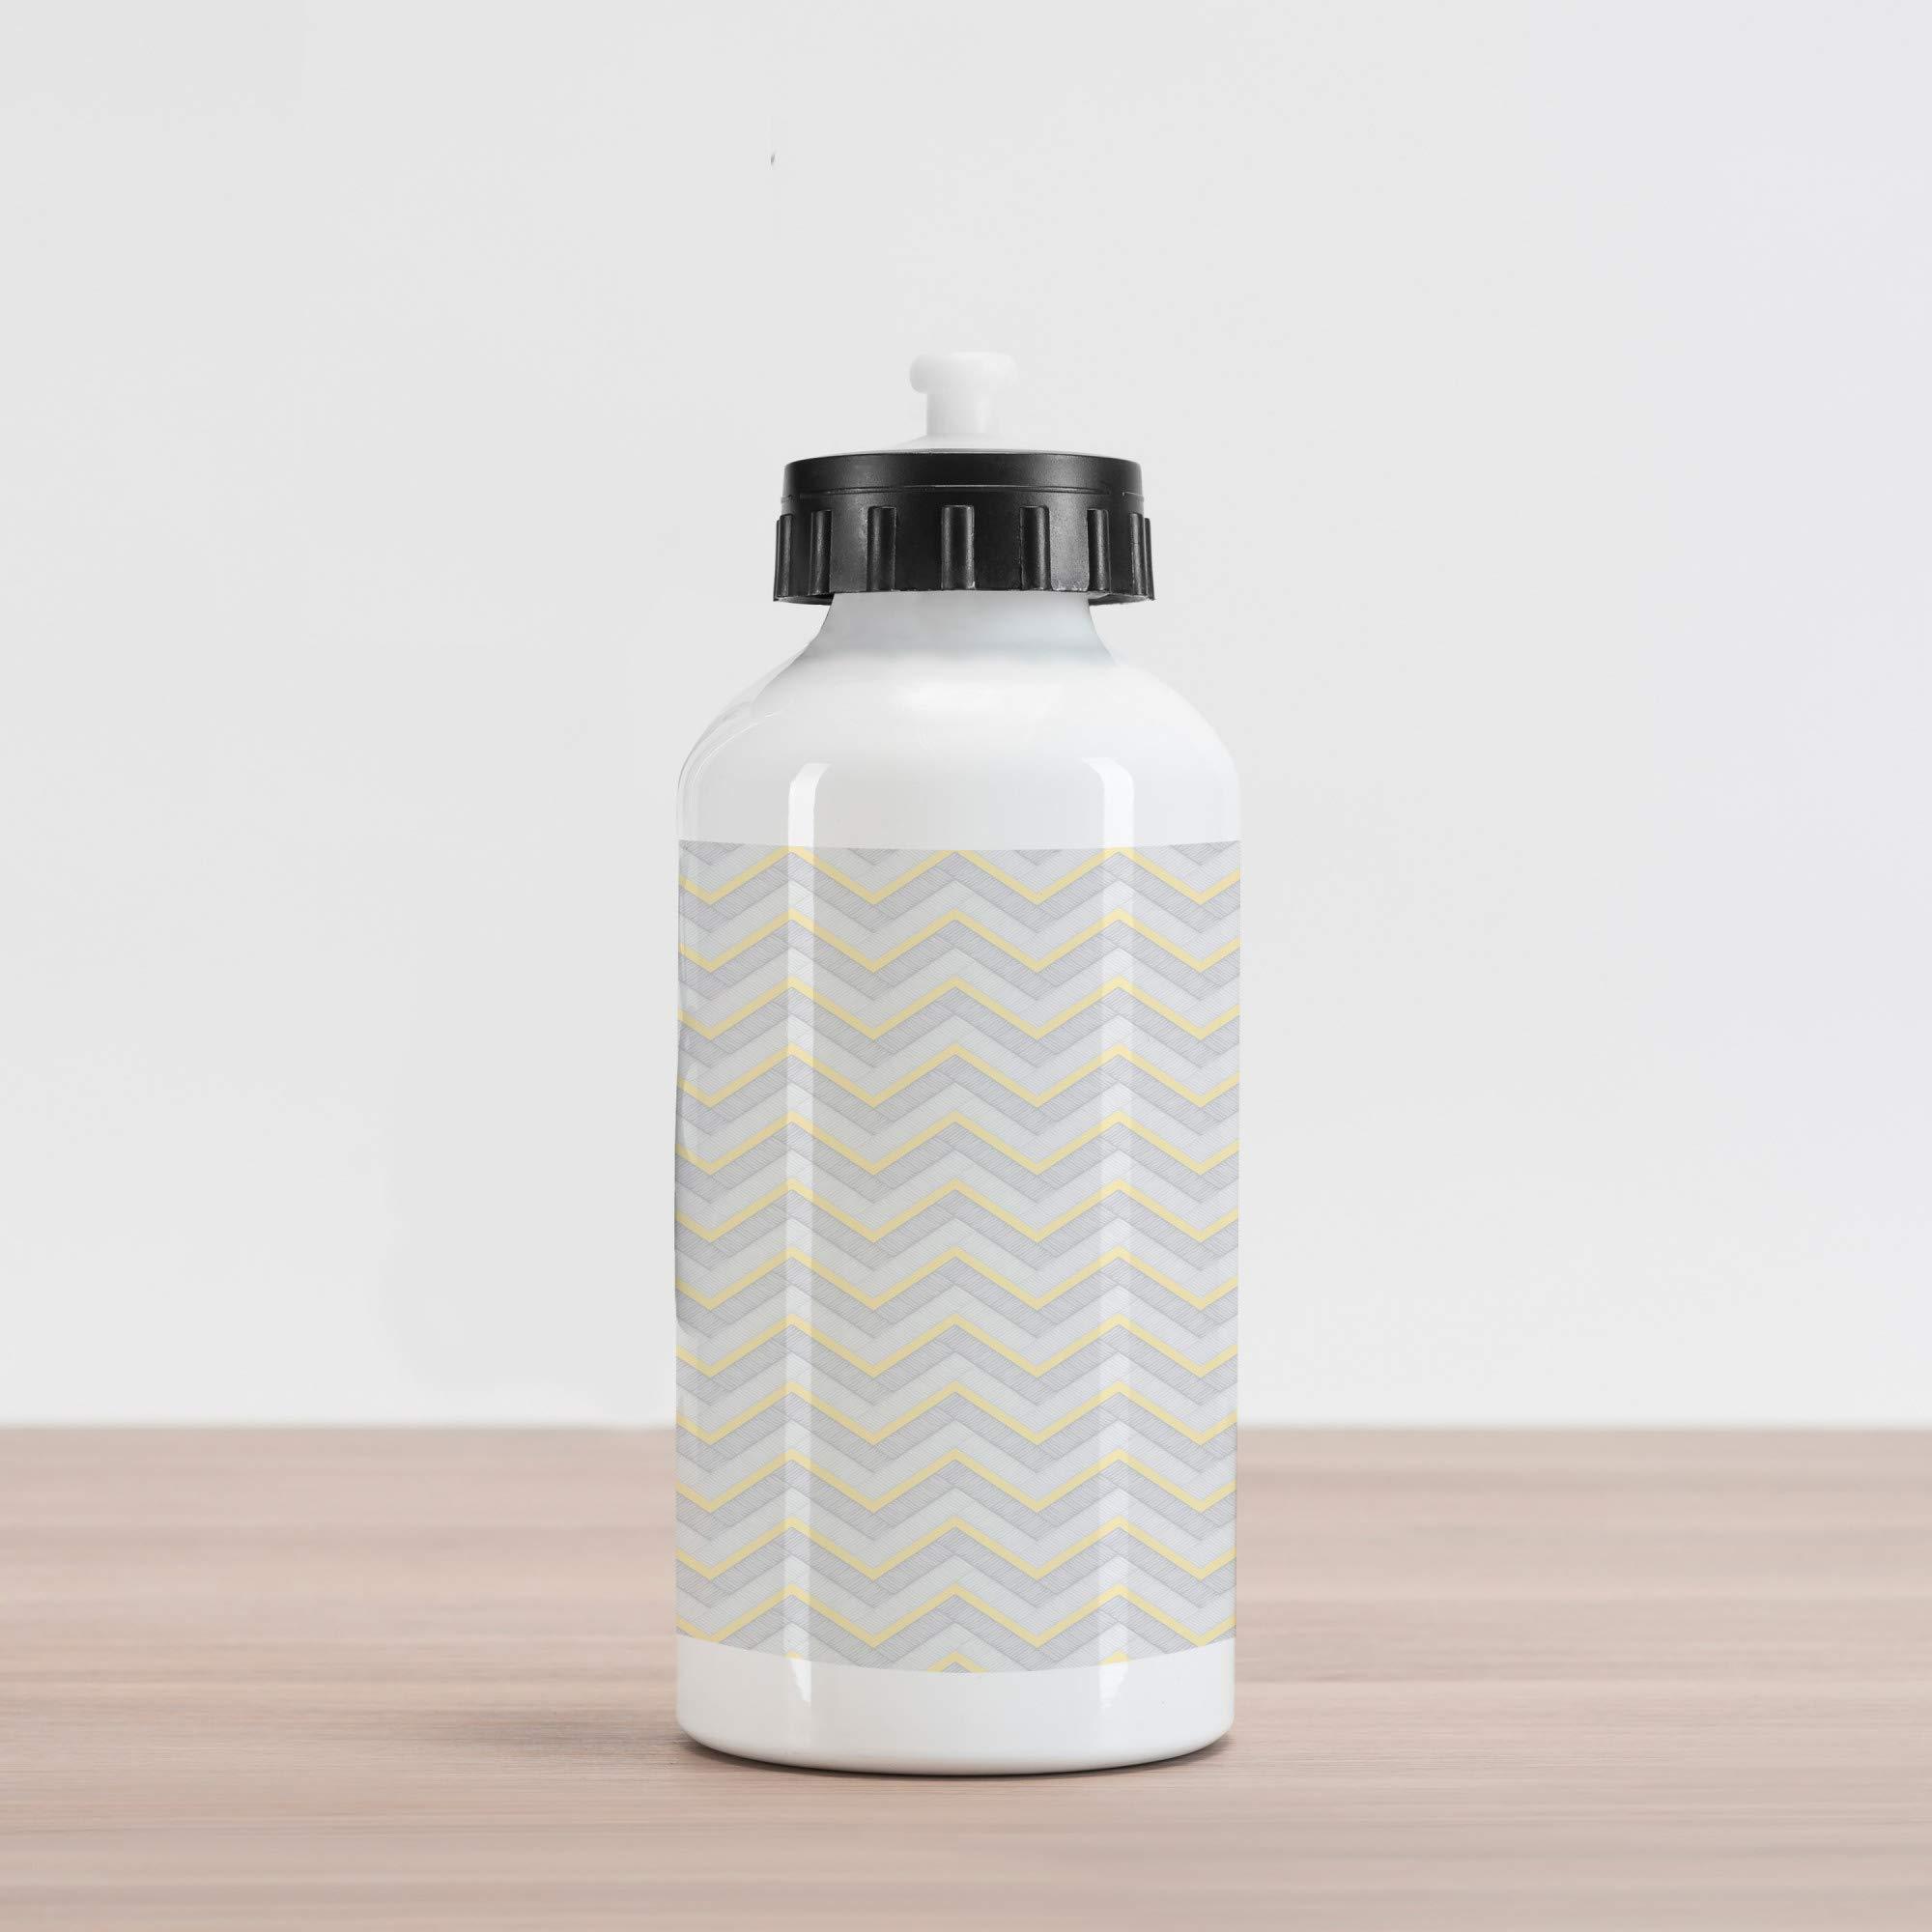 Inverted V Pattern – Patterns Gallery